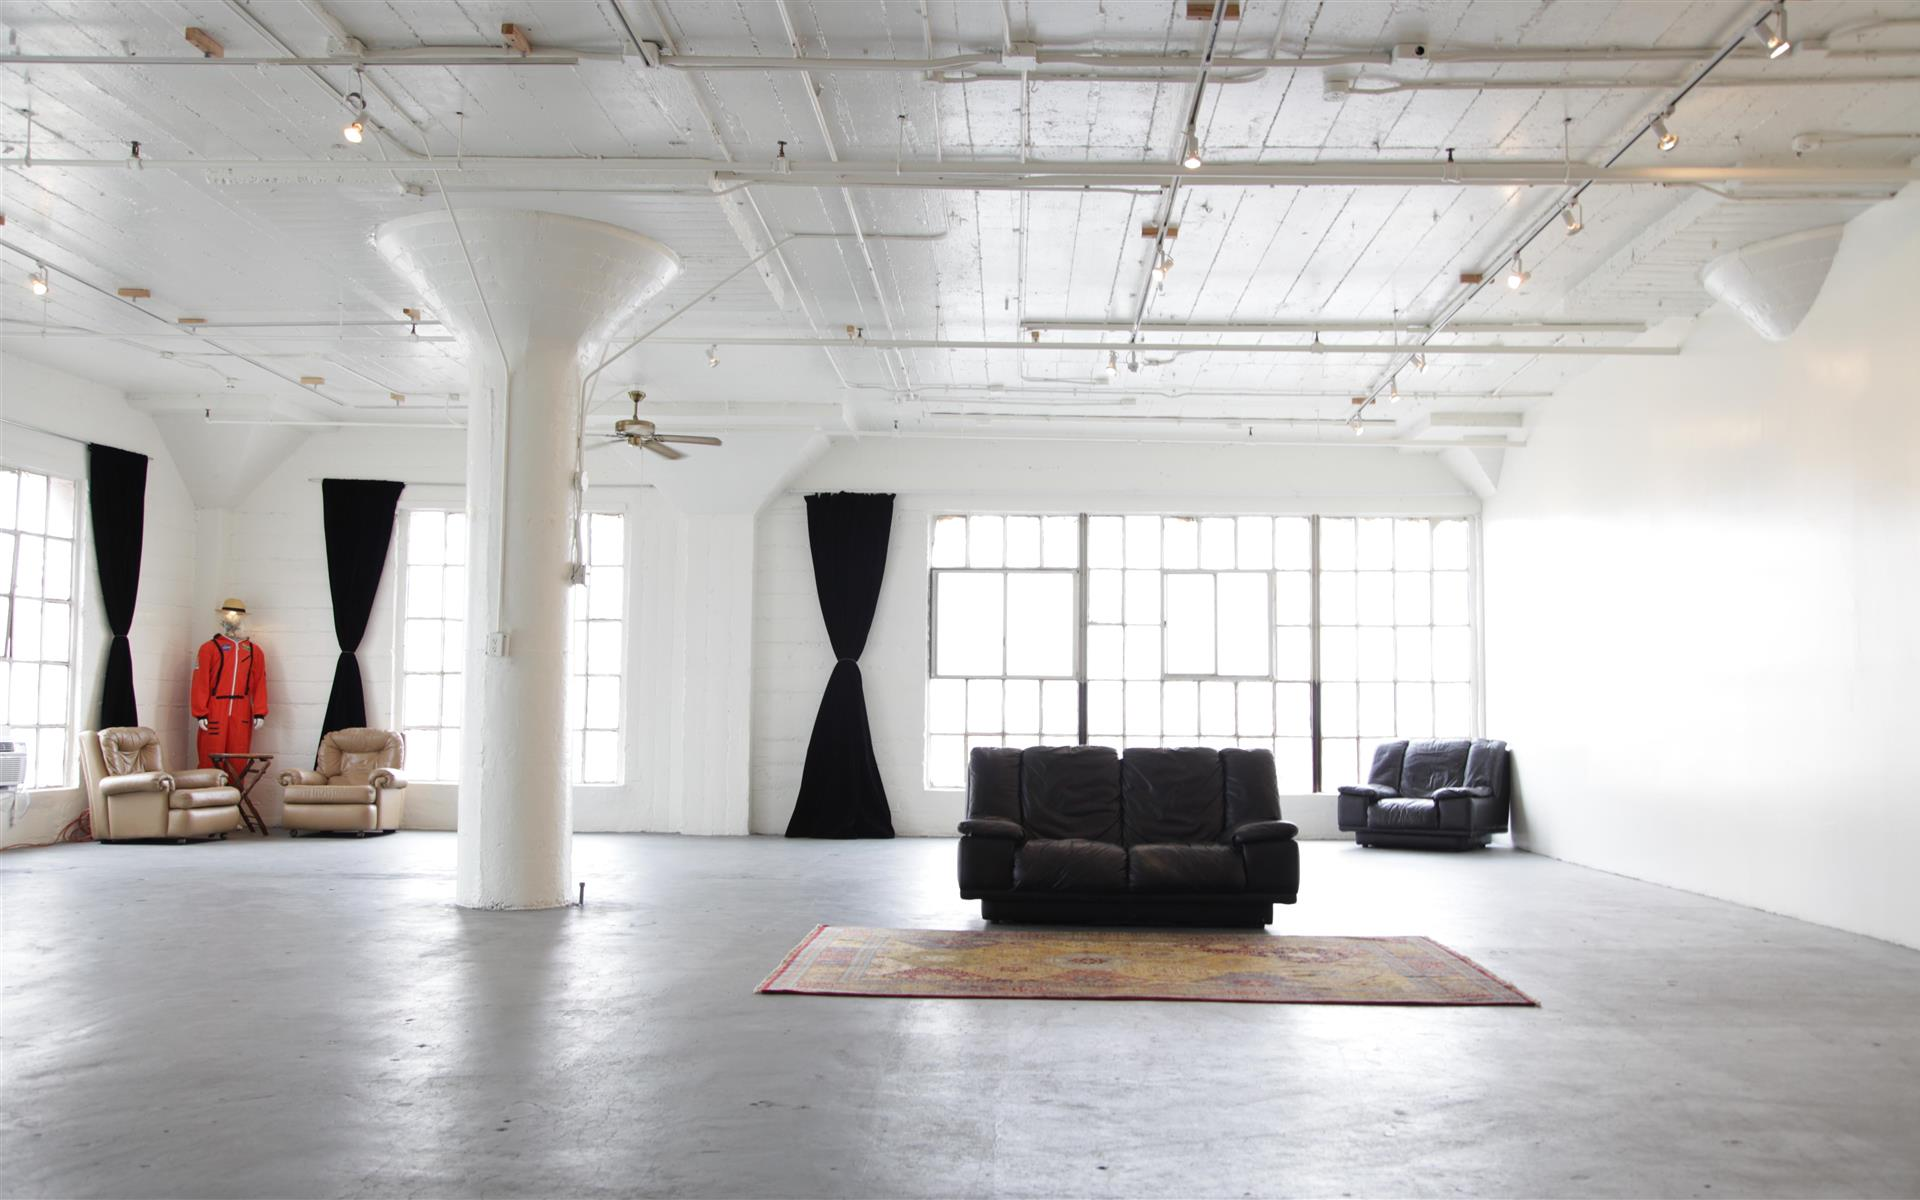 Astroetic Studios - Large Dtla Industrial Loft